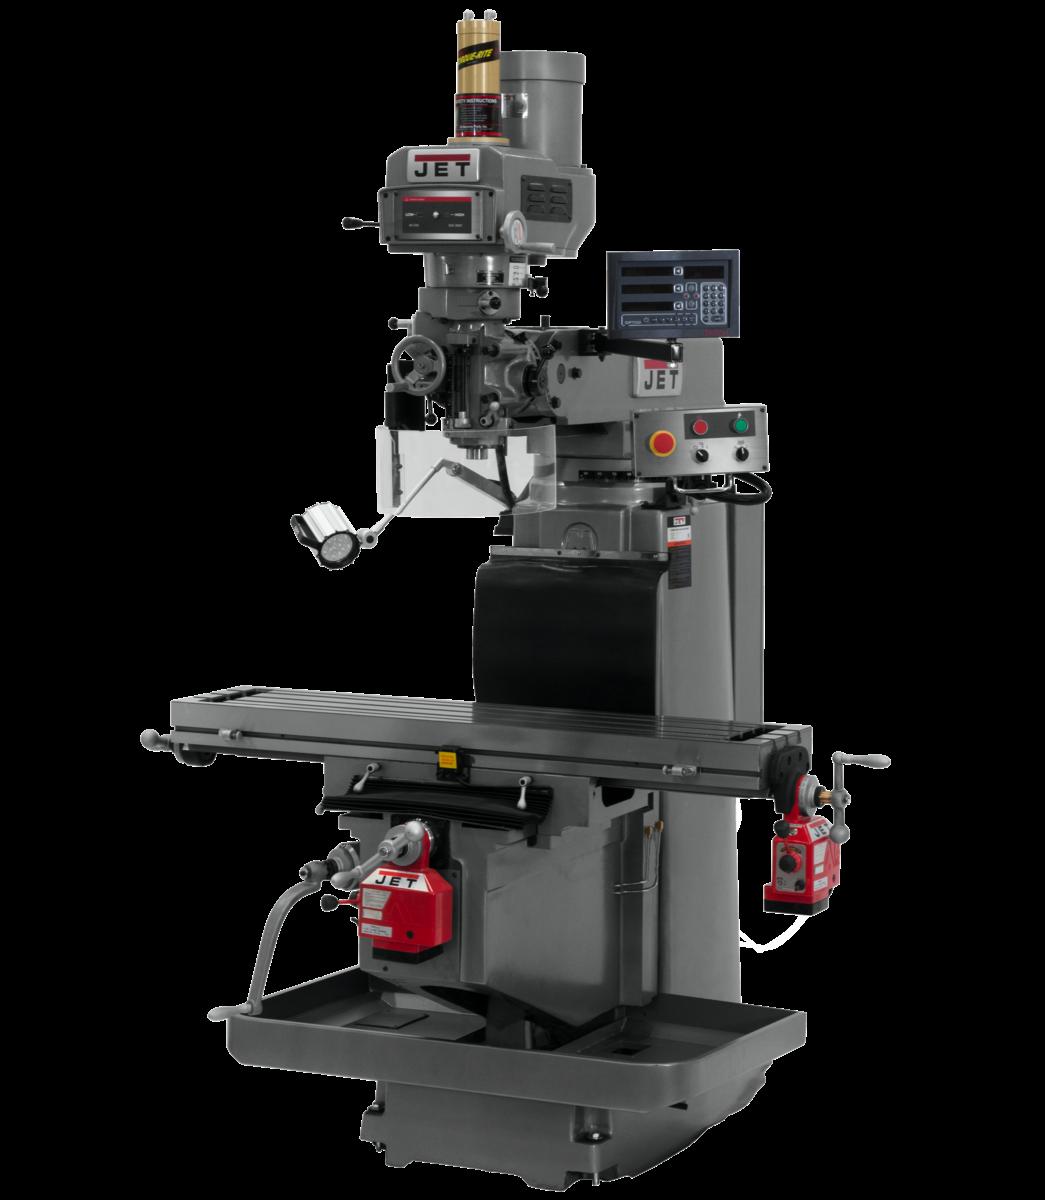 JTM-1254RVS with NEWALL DP700 3X (K) DRO,  X & Y Powerfeeds & Air Power Drawbar